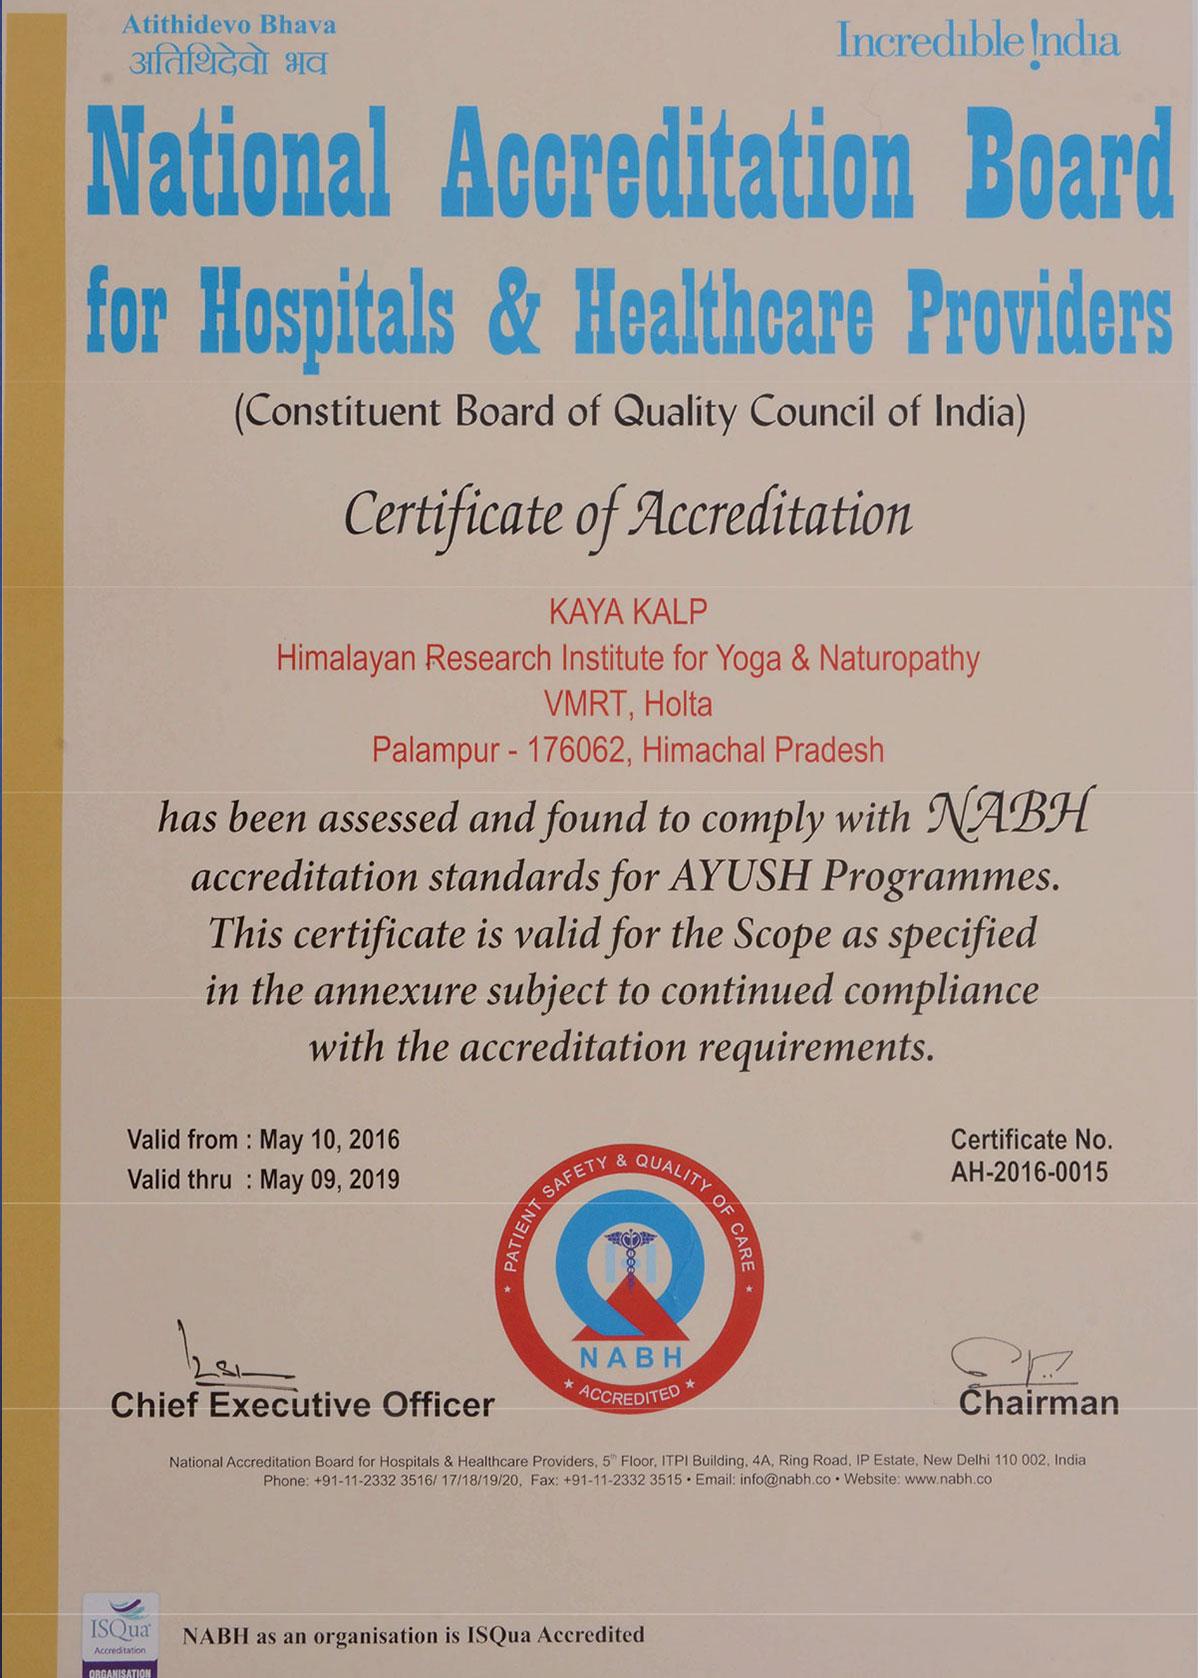 India's 1st NABH Accredited Yoga-Naturopathy Hospital and Himachal Pradesh's 1st and only AYUSH Accredited Hospital by NABH